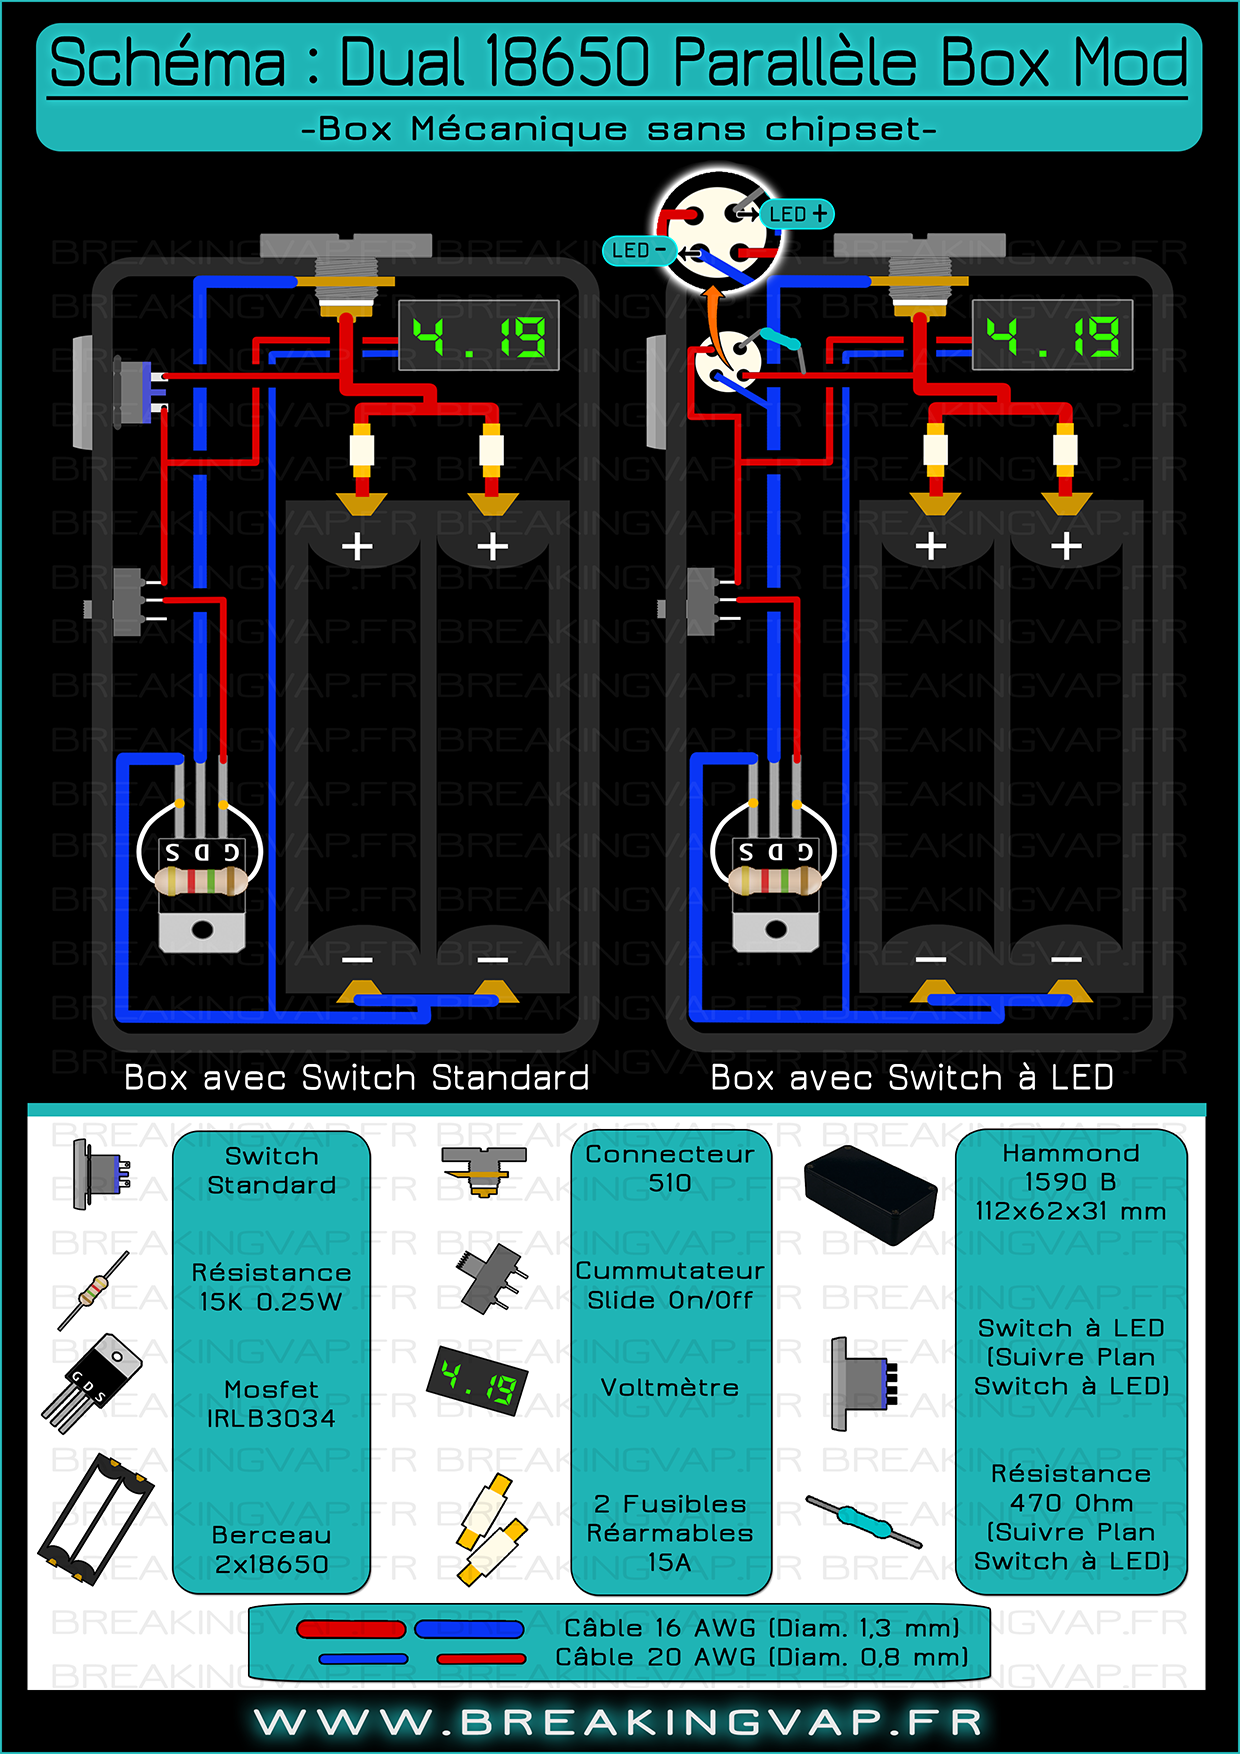 medium resolution of sch ma box mod dual 18650 parallele